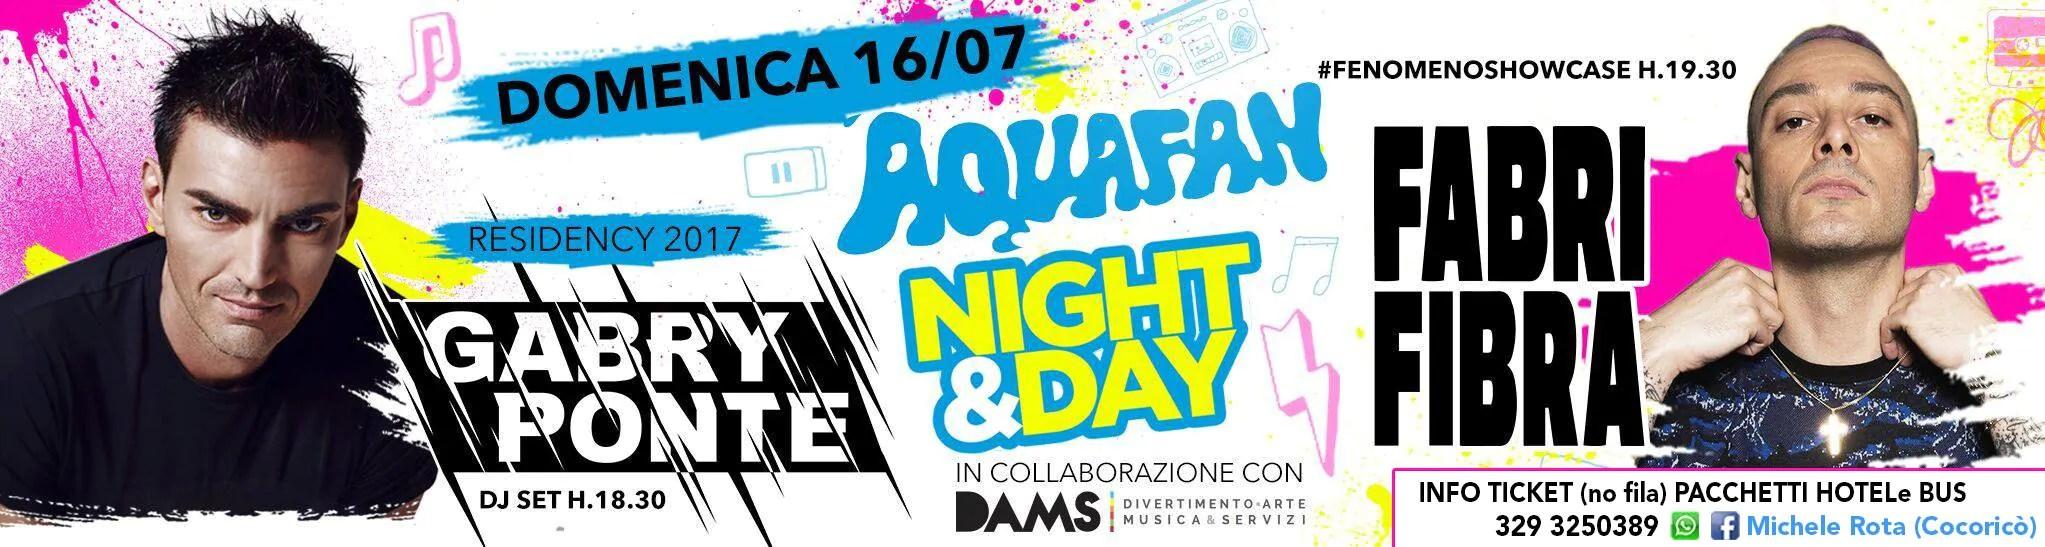 Aquafan 16 07 2017 Gabry Ponte Fabri Fibra